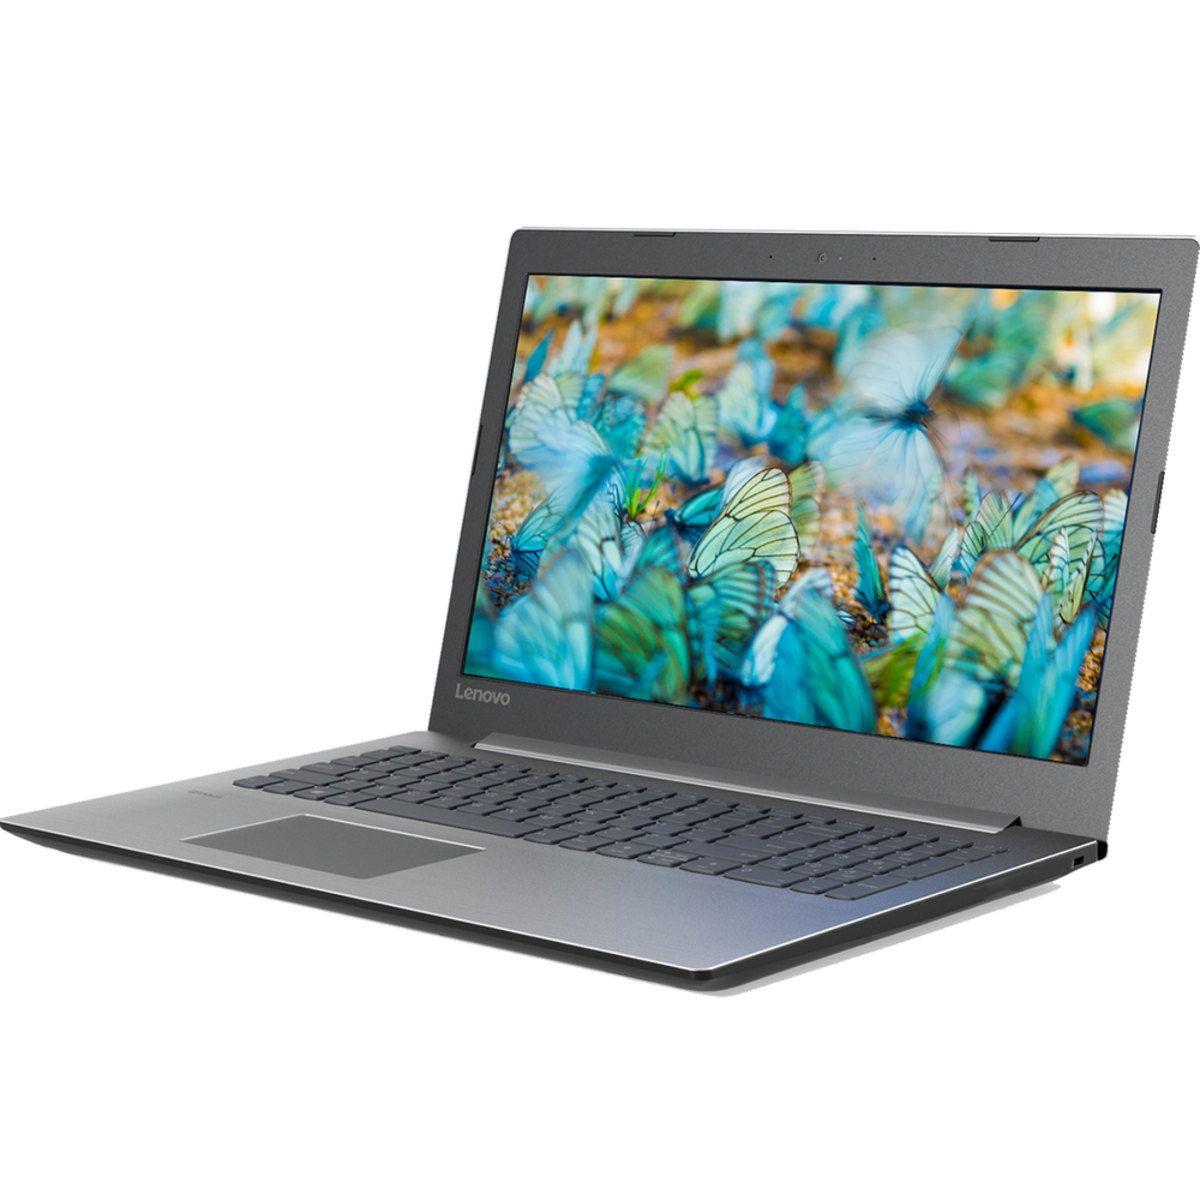 Notebook Ideapad 330 i3 7020U 4GB 1TB Linux 15,6 81FES00100  Prata - Lenovo